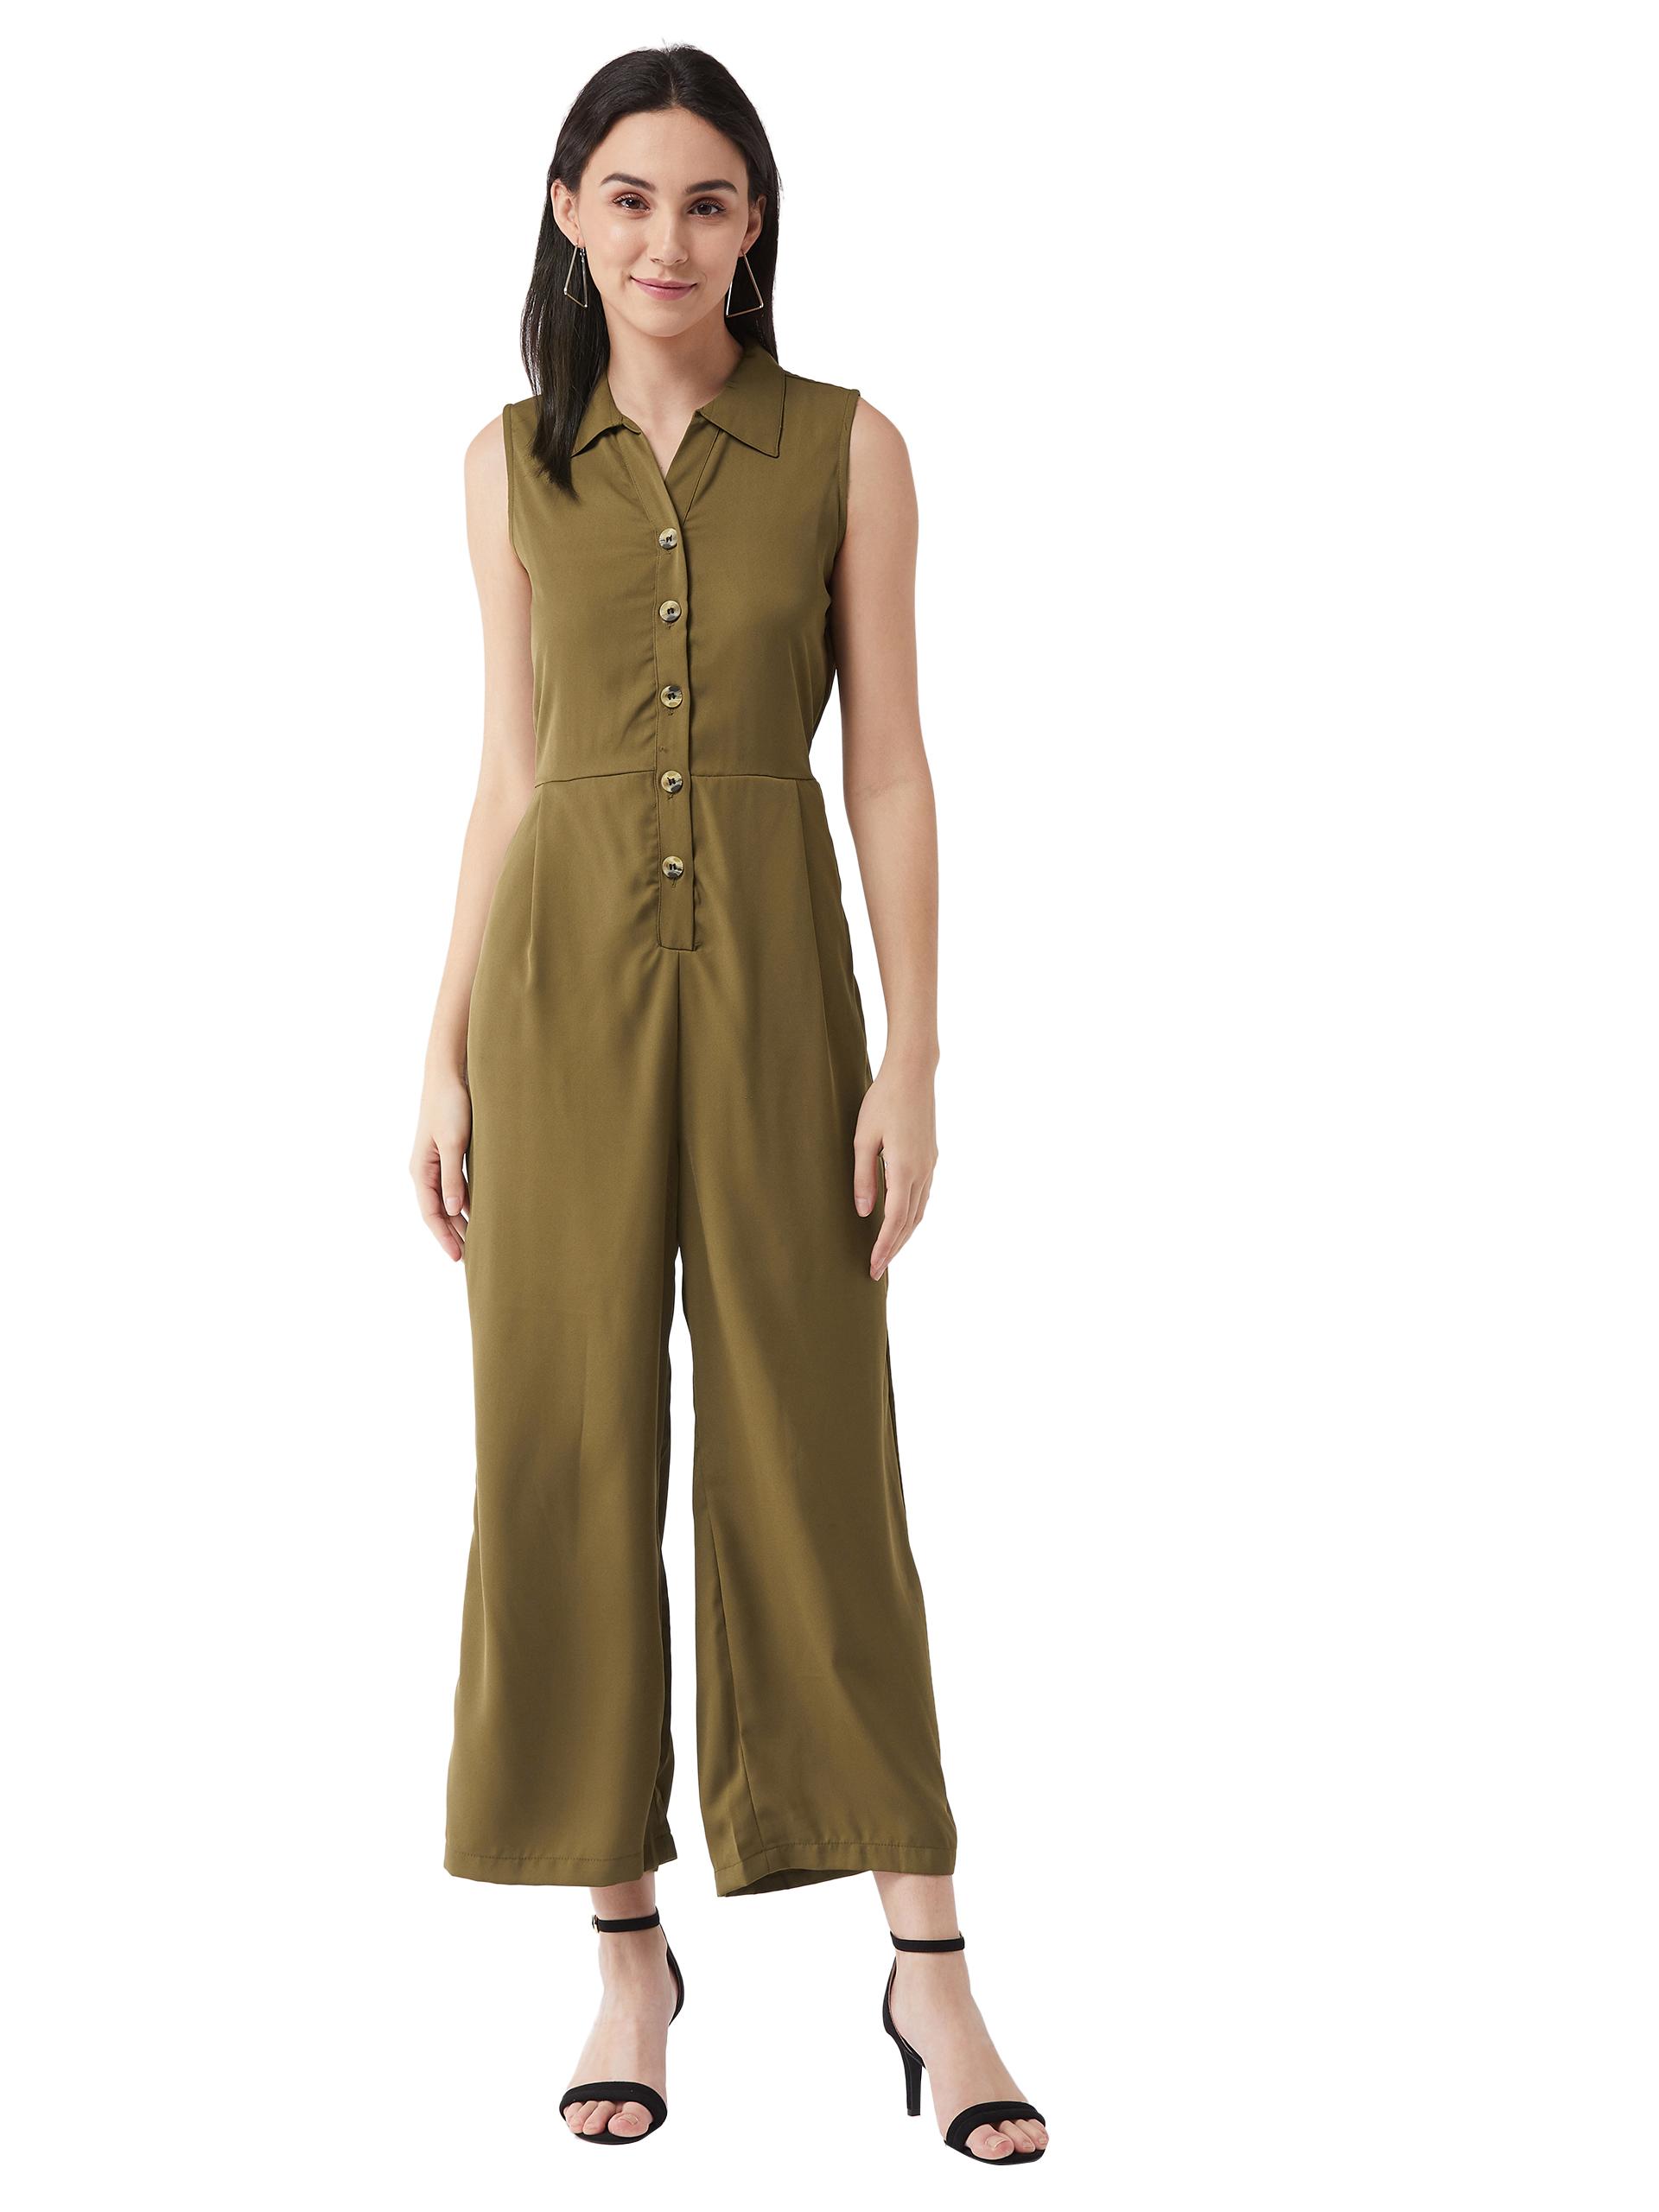 MISS CHASE |  Olive Green Solid Regular Length V - Neck Sleeveless Front Pleat Wide Leg Jumpsuit